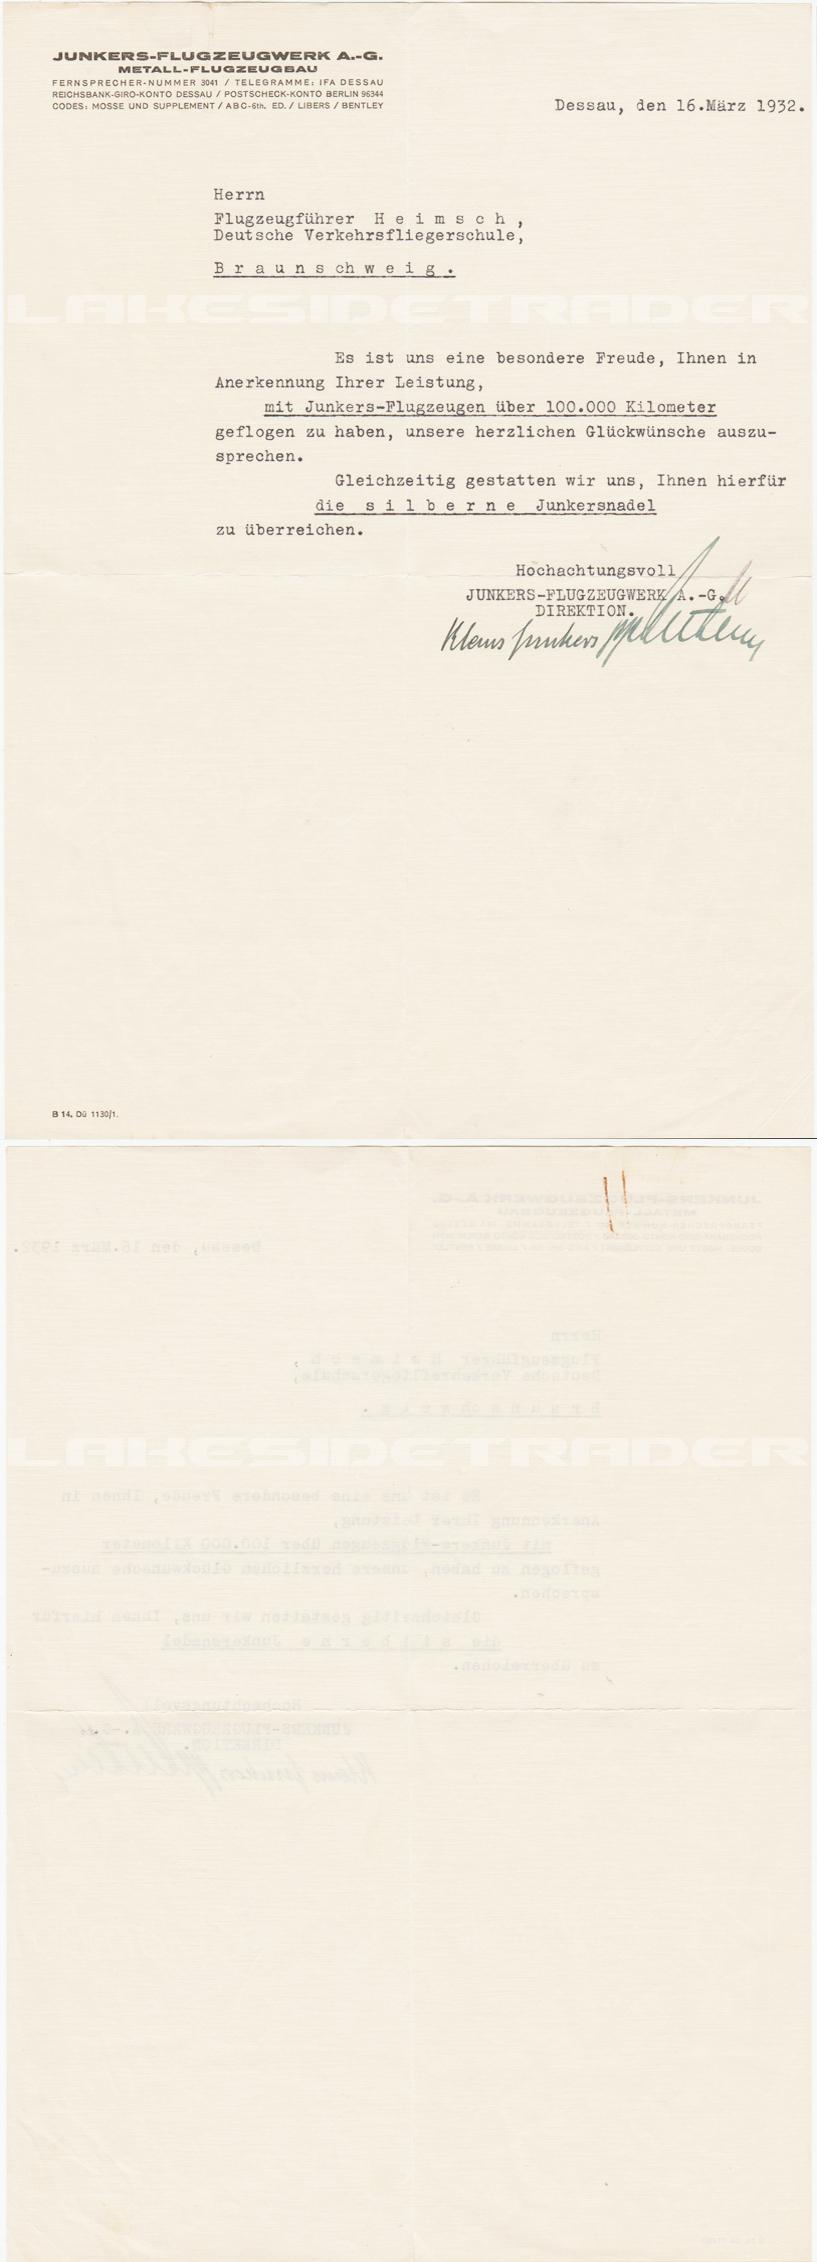 Junkers Flugzeugwerk 100,000 Km Flight Recognition Document 1932